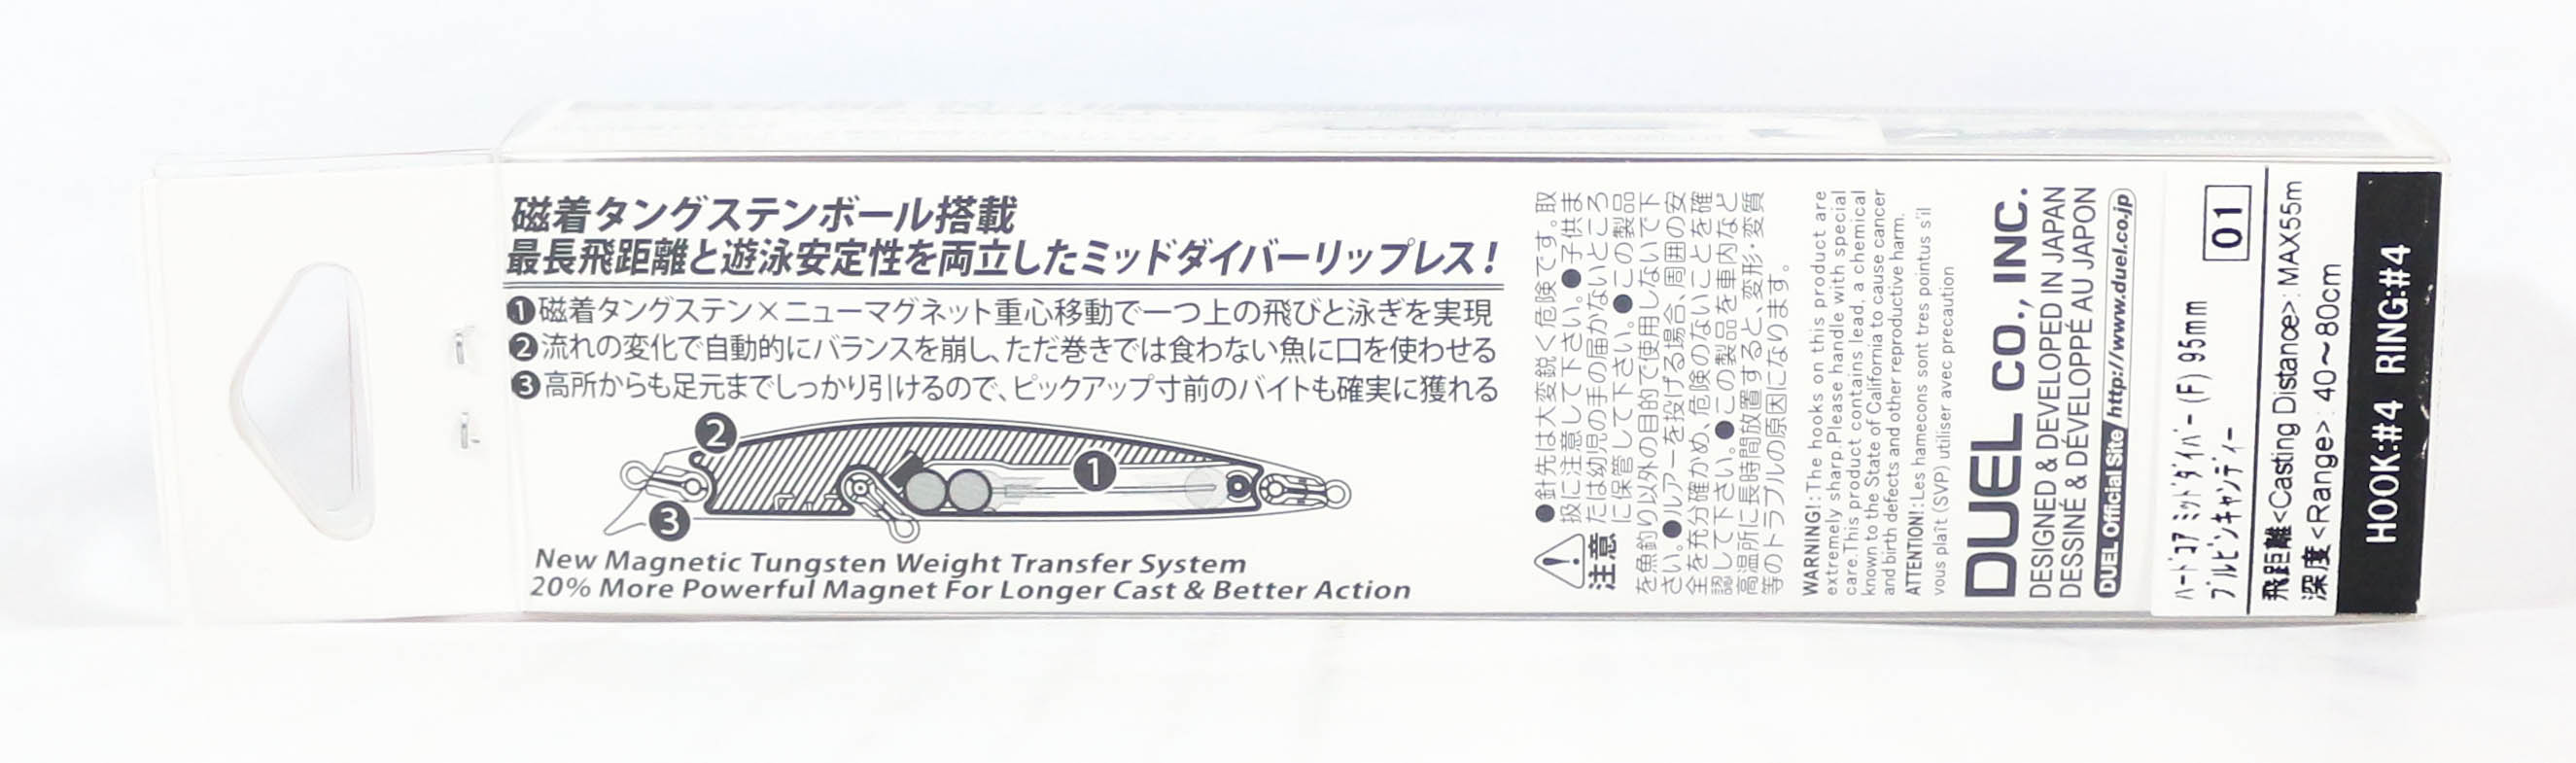 5696 Yo Zuri Duel Hardcore Mid Diver 95 Floating Lure F1191-HBPC